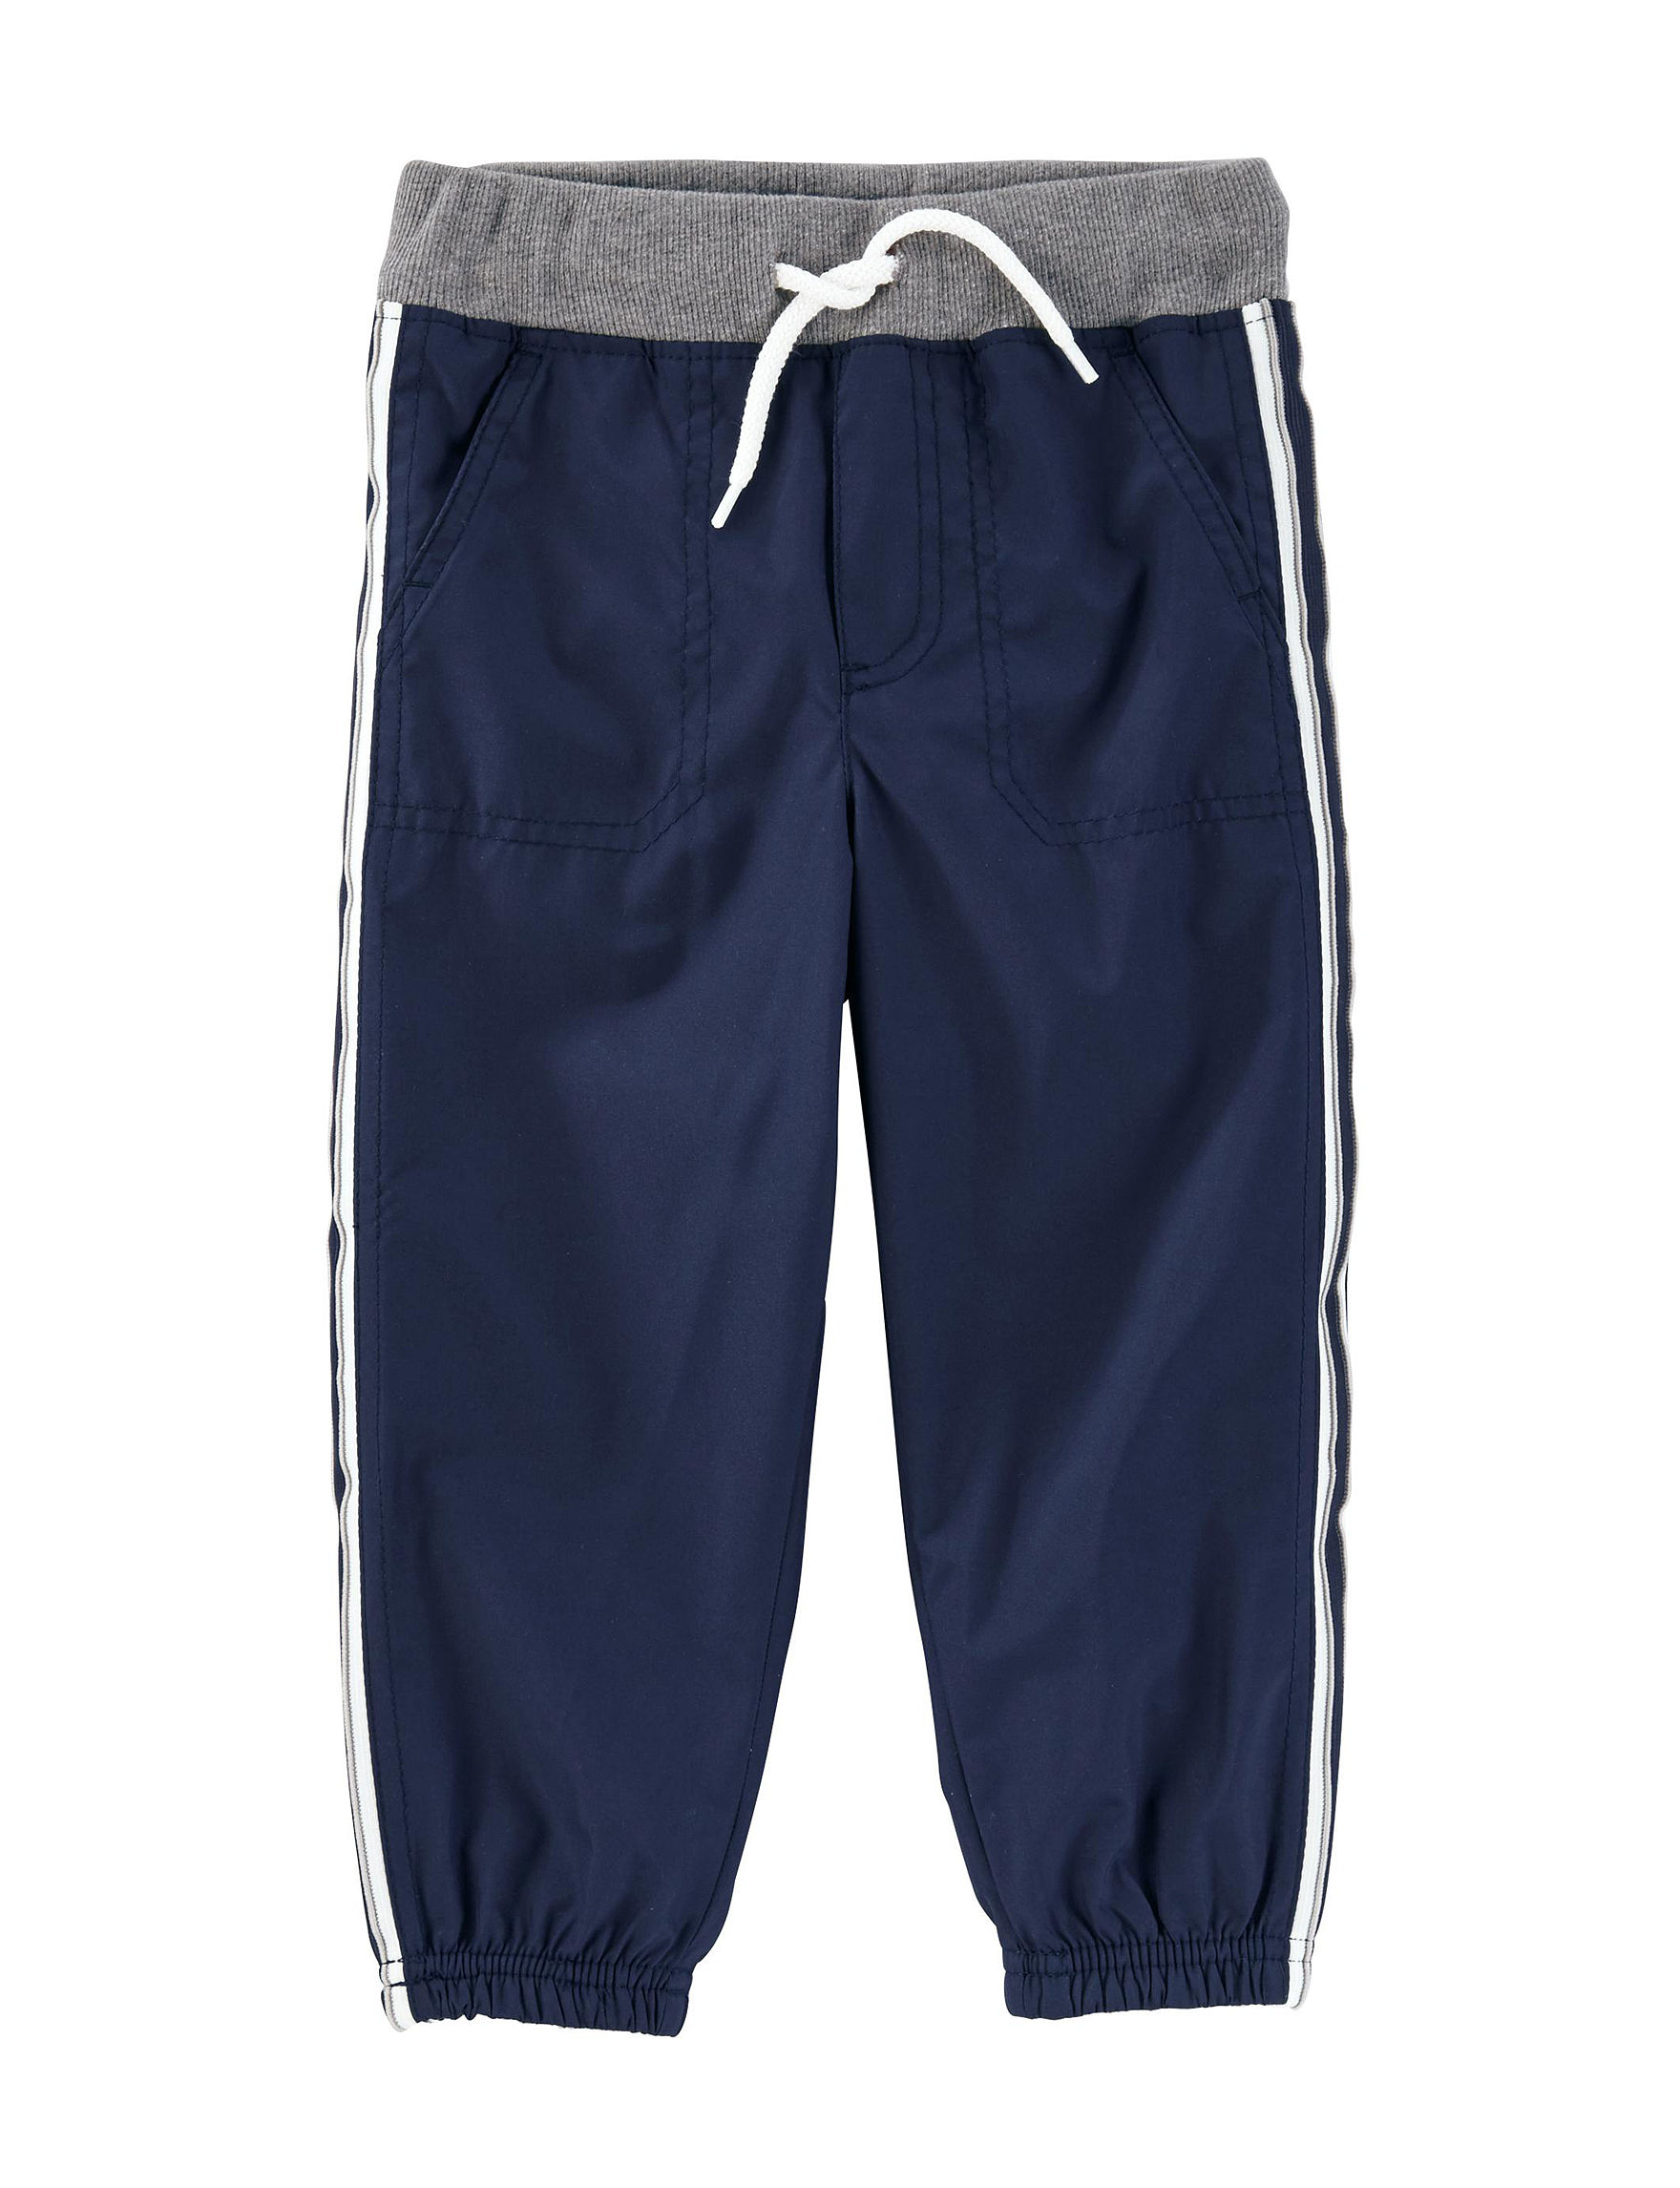 Oshkosh B'Gosh Blue Soft Pants